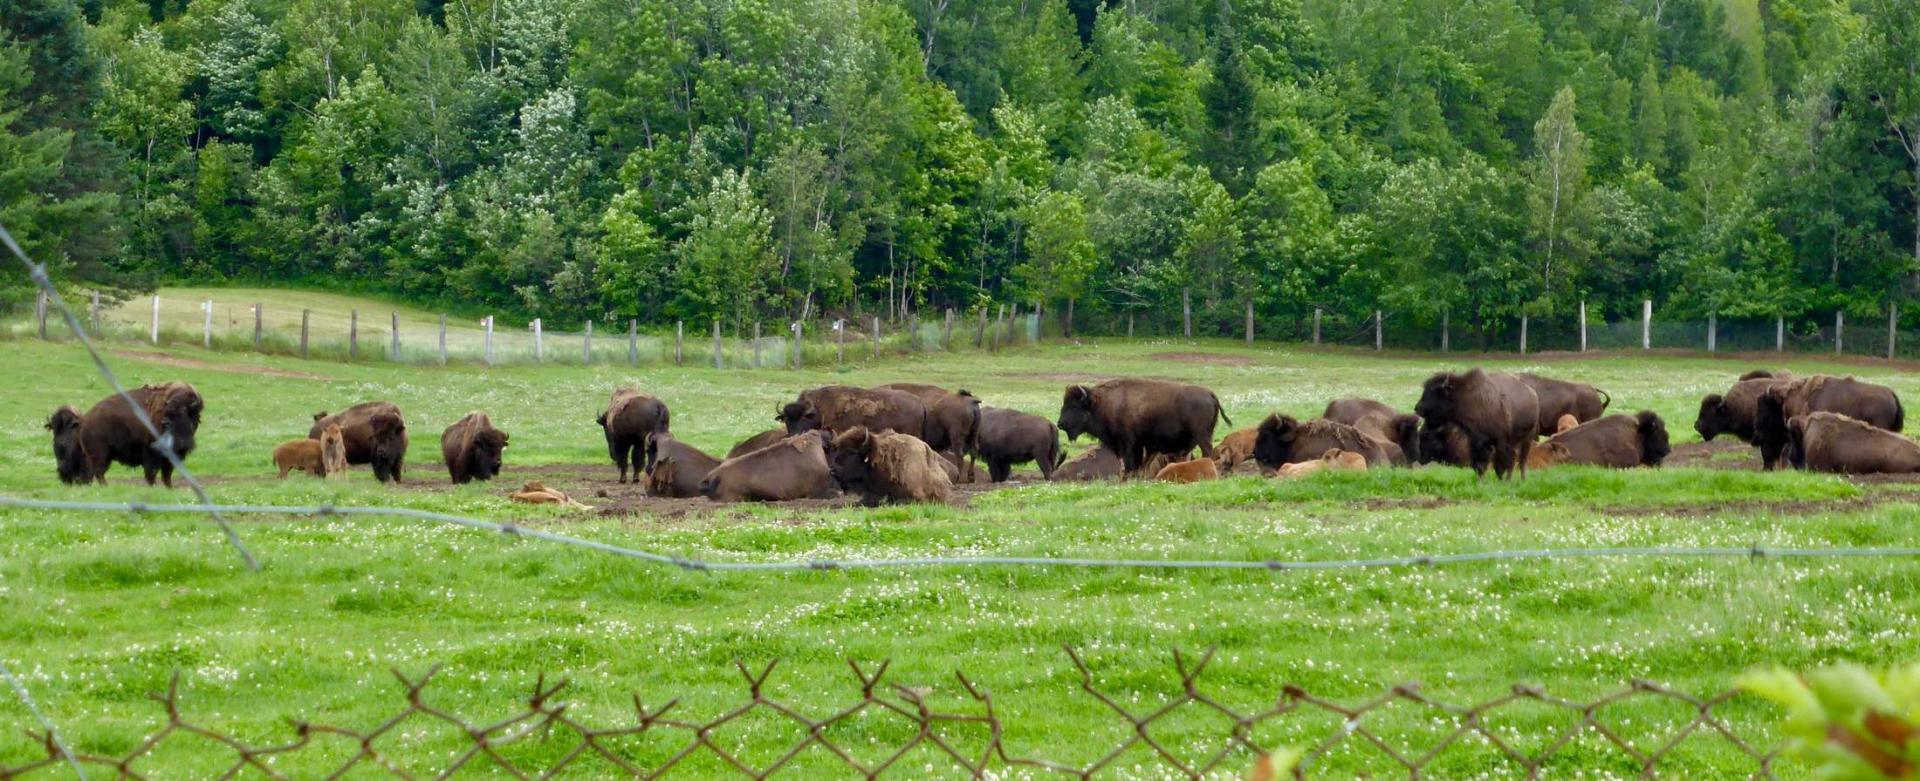 Terre des Bisons, Rawdon